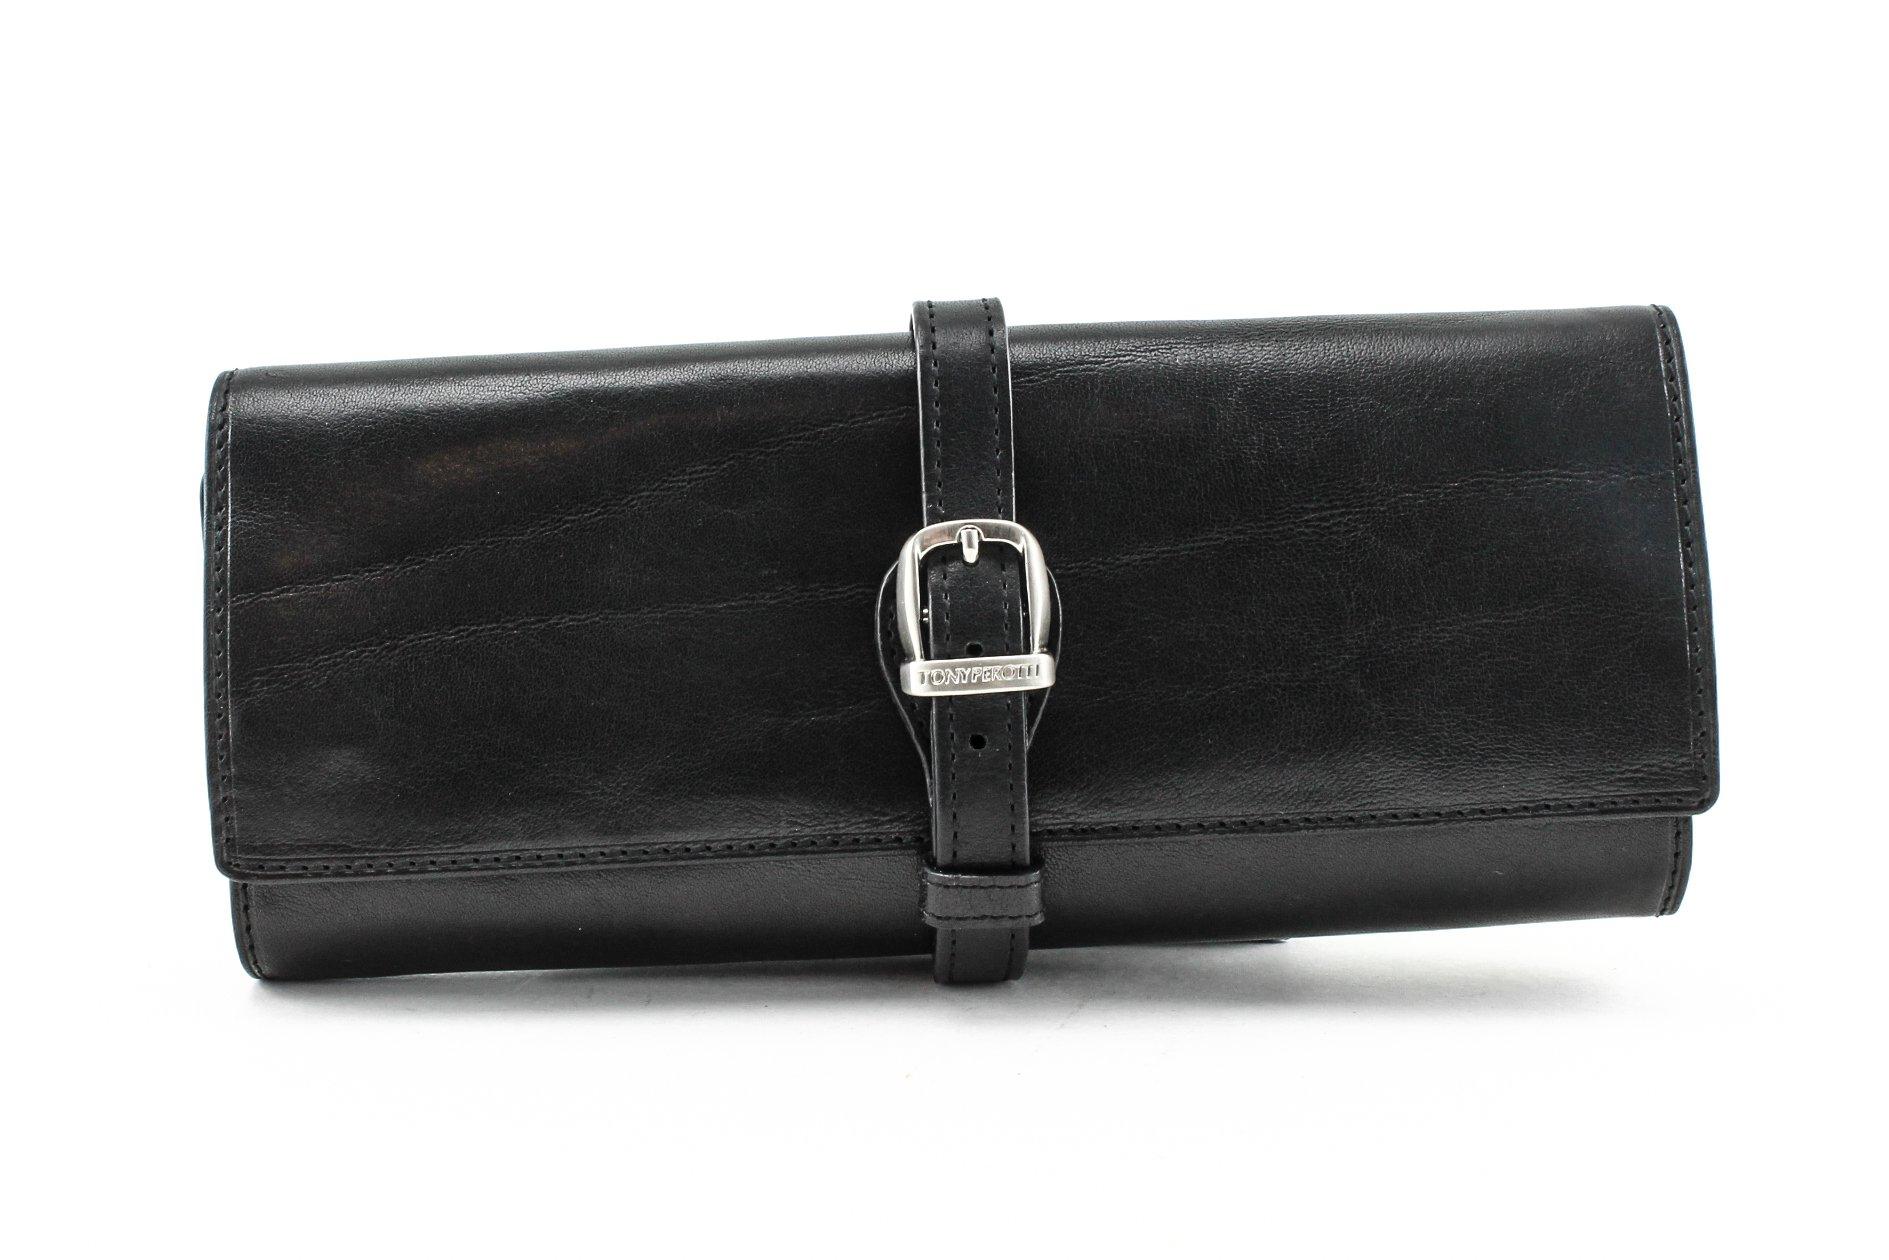 Tony Perotti Womens Italian Bull Leather Grande Jewelry Roll Travel Organizer in Black